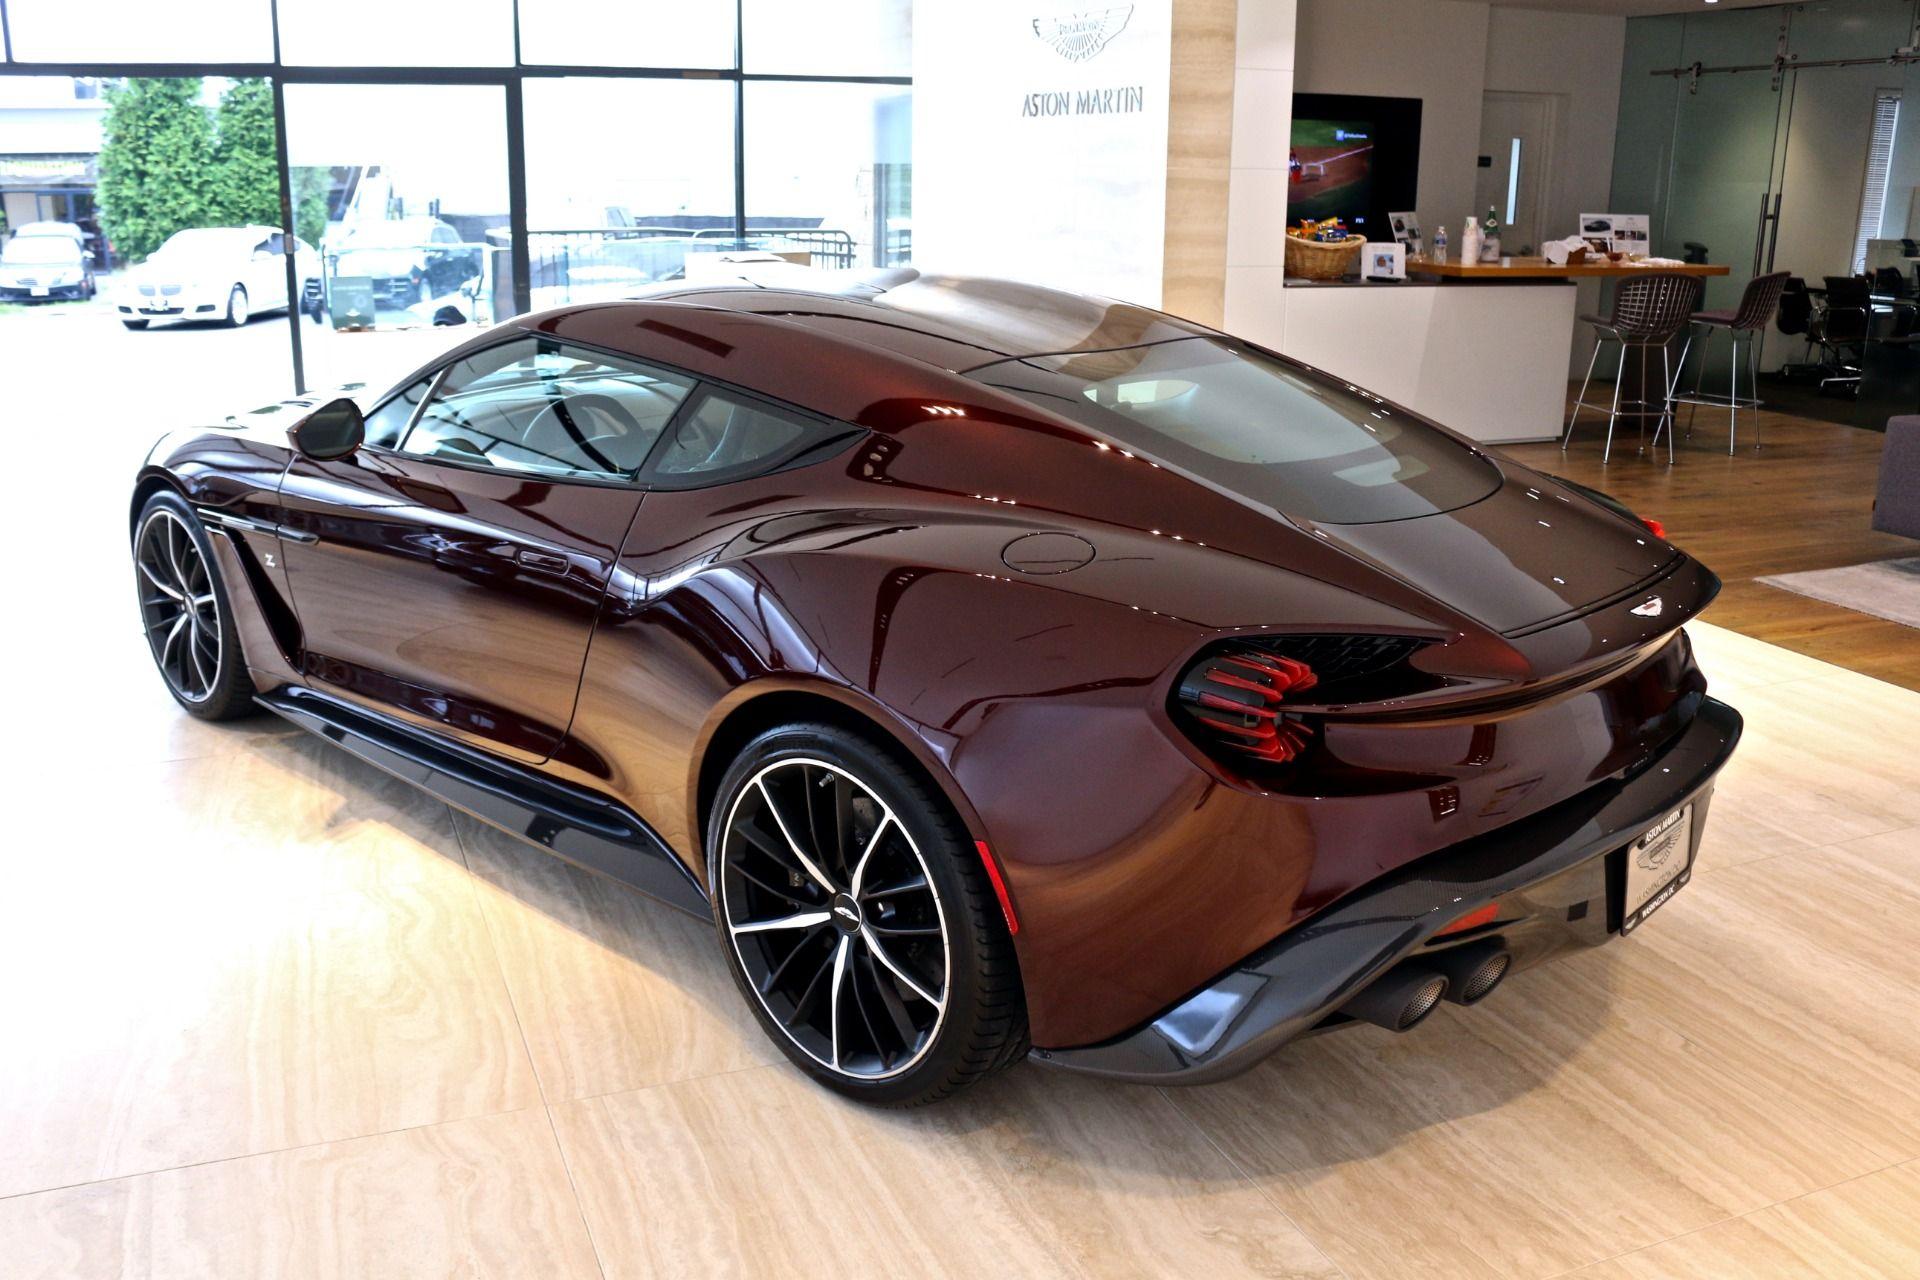 2018 Aston Martin Vanquish Zagato Coupe 78 99 Stock Pj33902 For Sale Near Vienna Va Va Aston Martin Dealer In 2021 Aston Martin Vanquish Aston Martin Vanquish